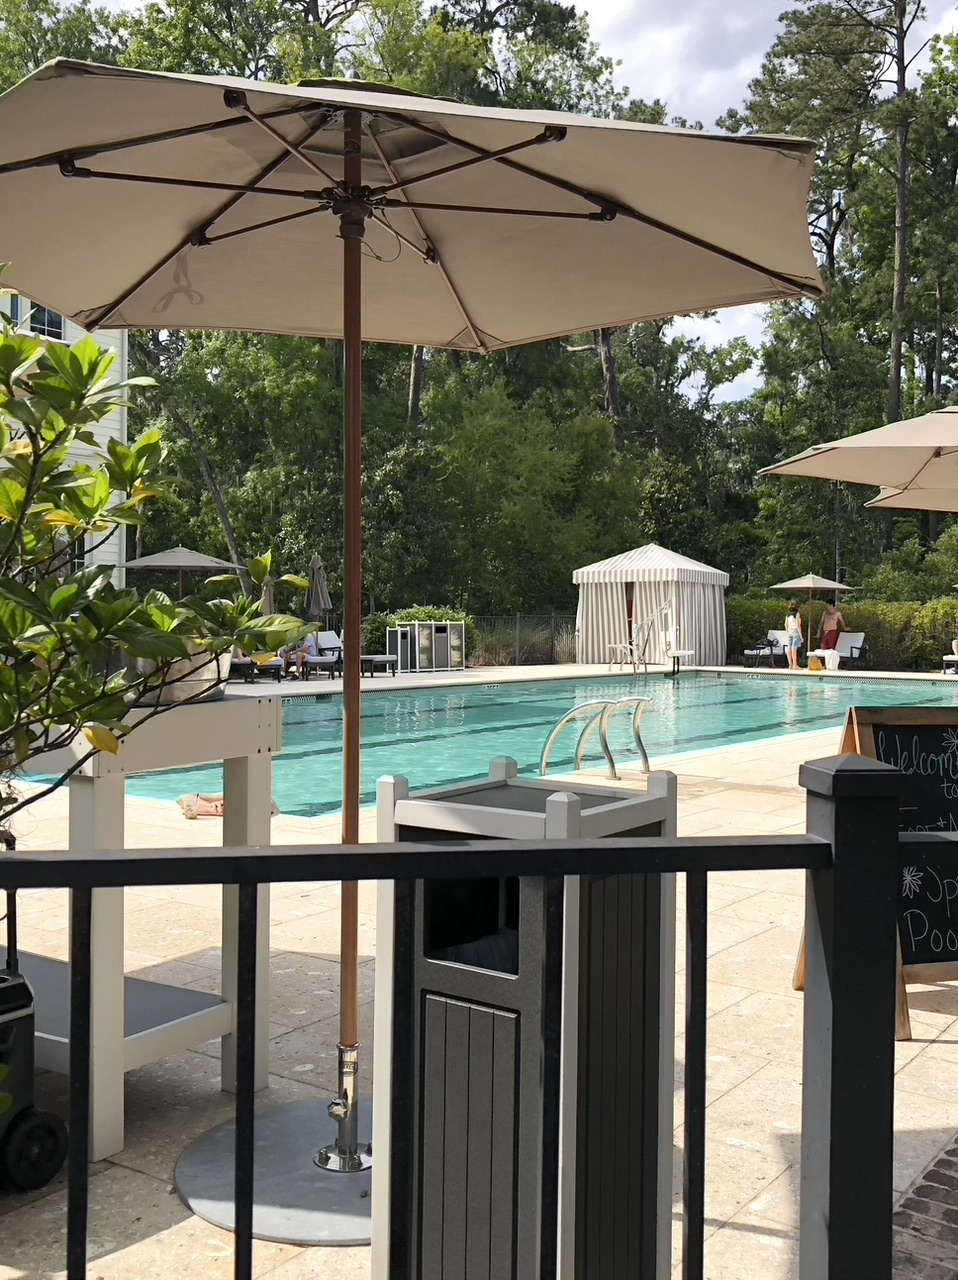 adult pool Palmetto Bluff misscrystalblog